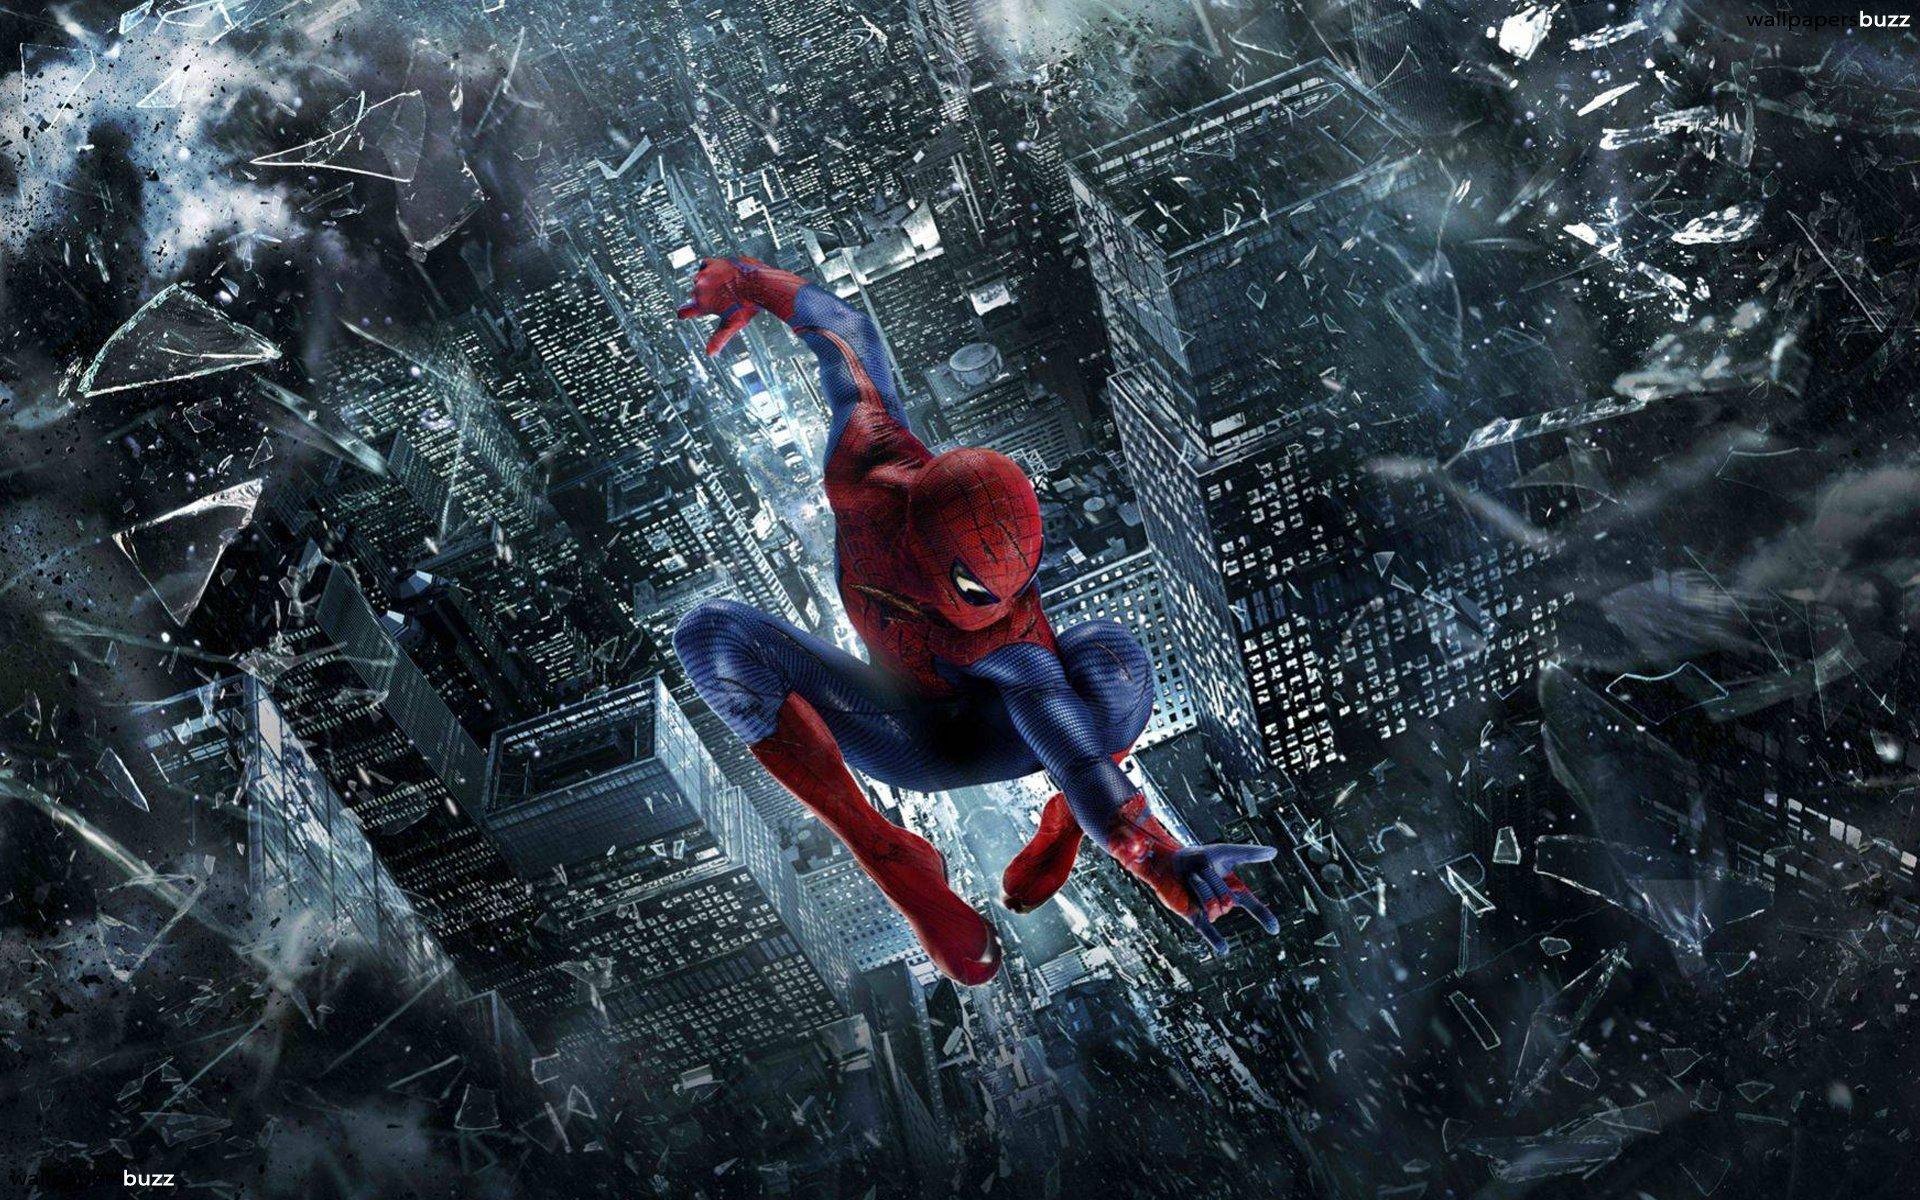 fantasy comics movie spider spiderman marvel superhero 59 wallpaper 1920x1200